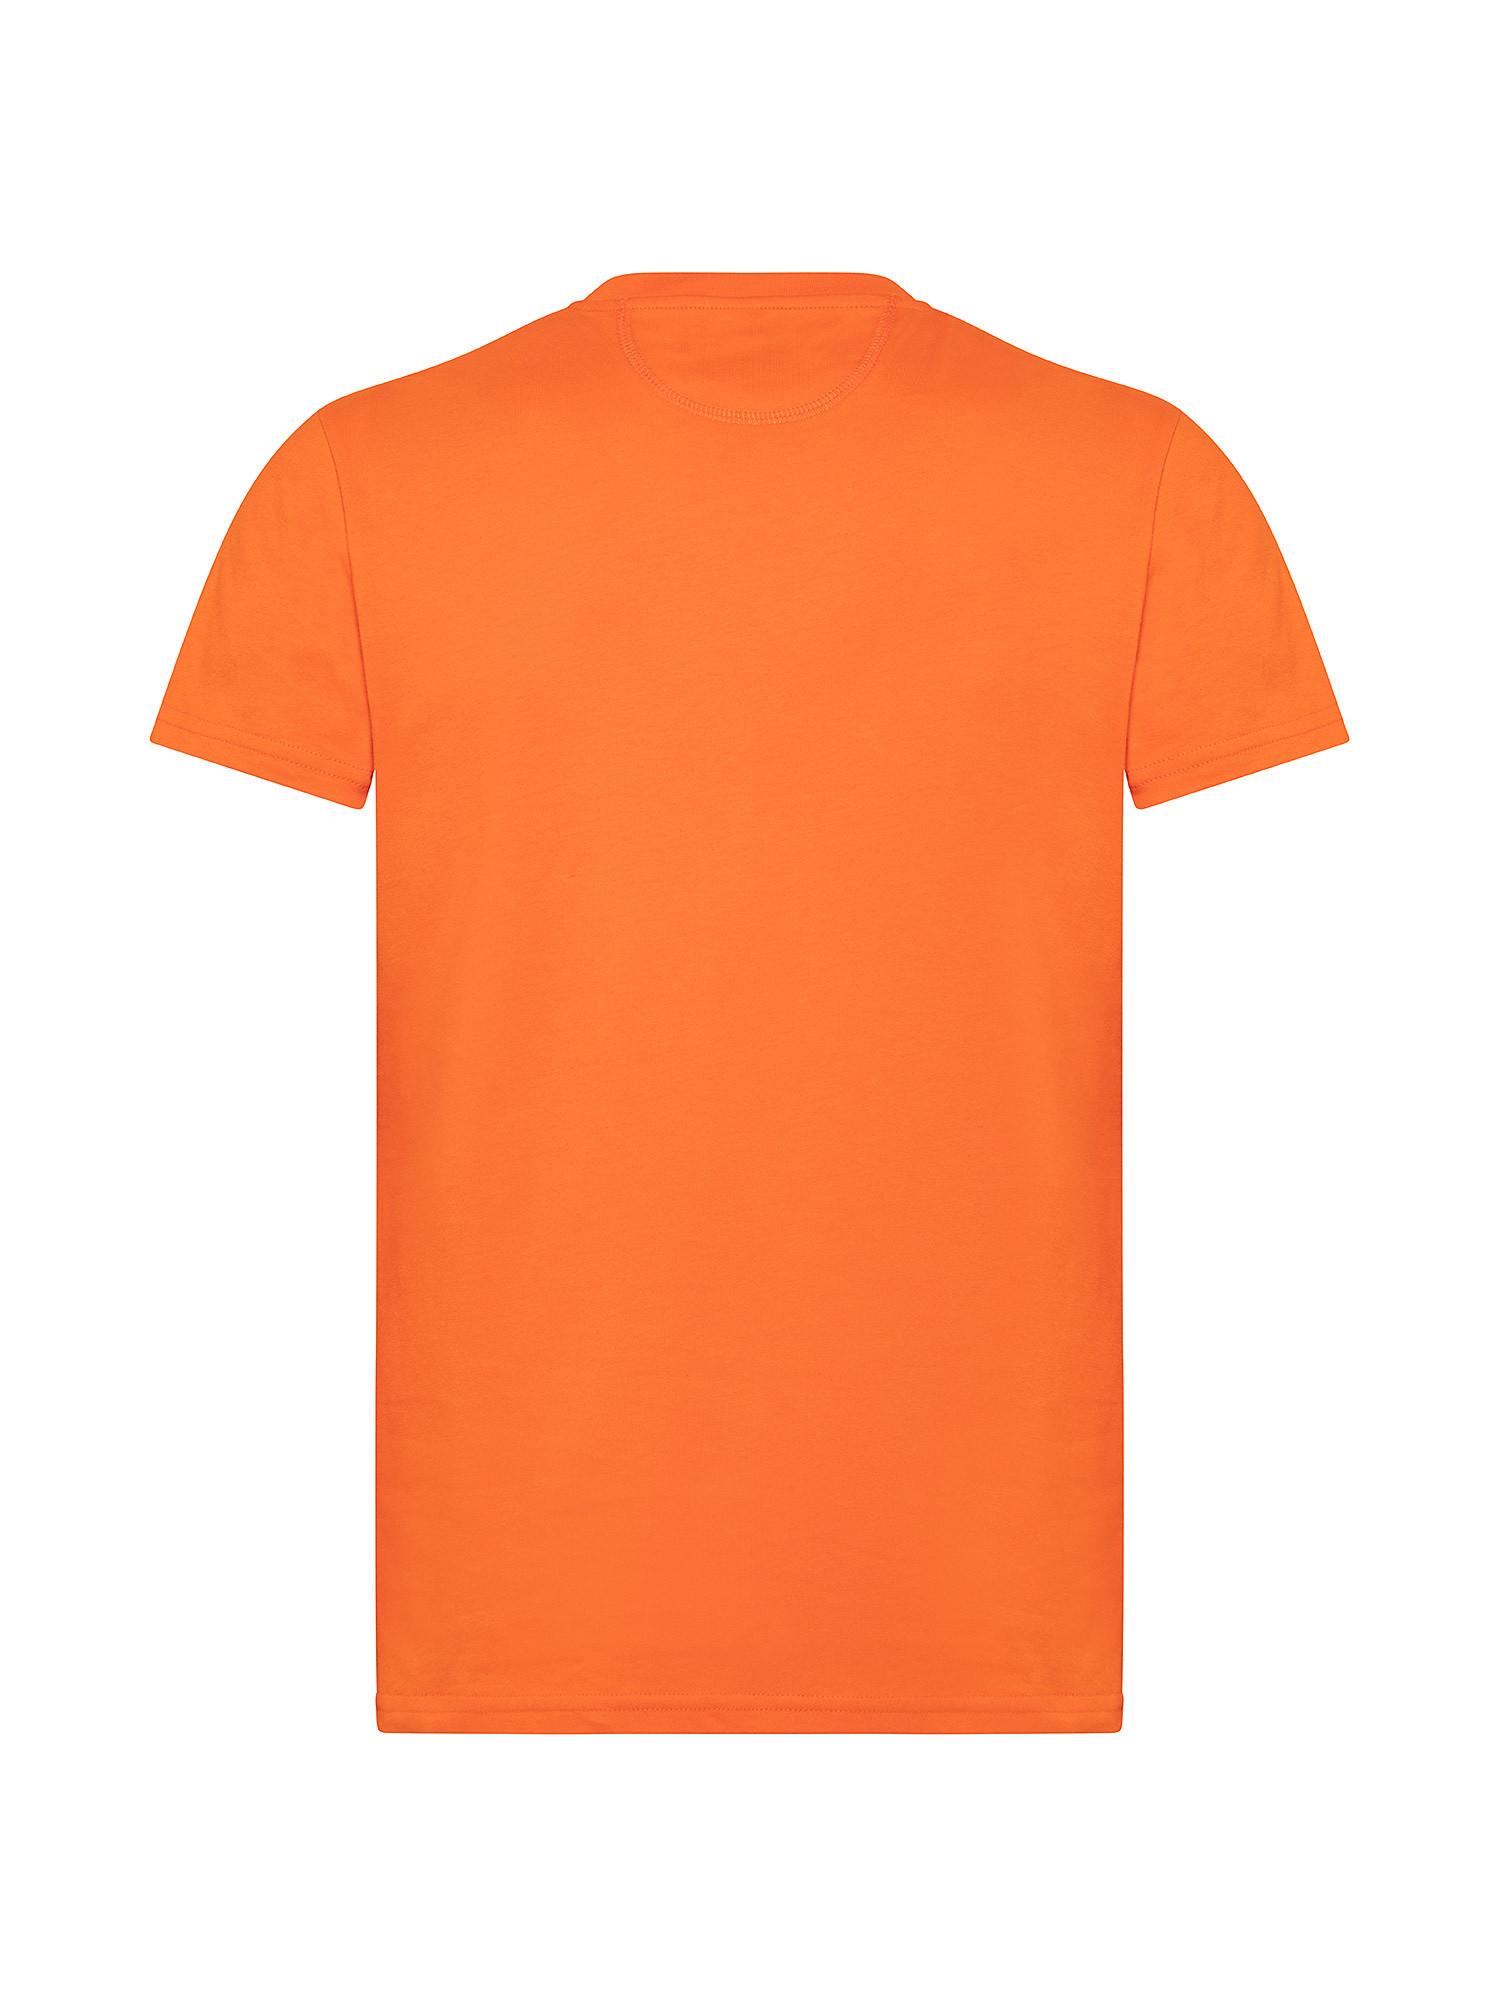 T-shirt da uomo in cotone 100% regular fit, Arancione, large image number 1